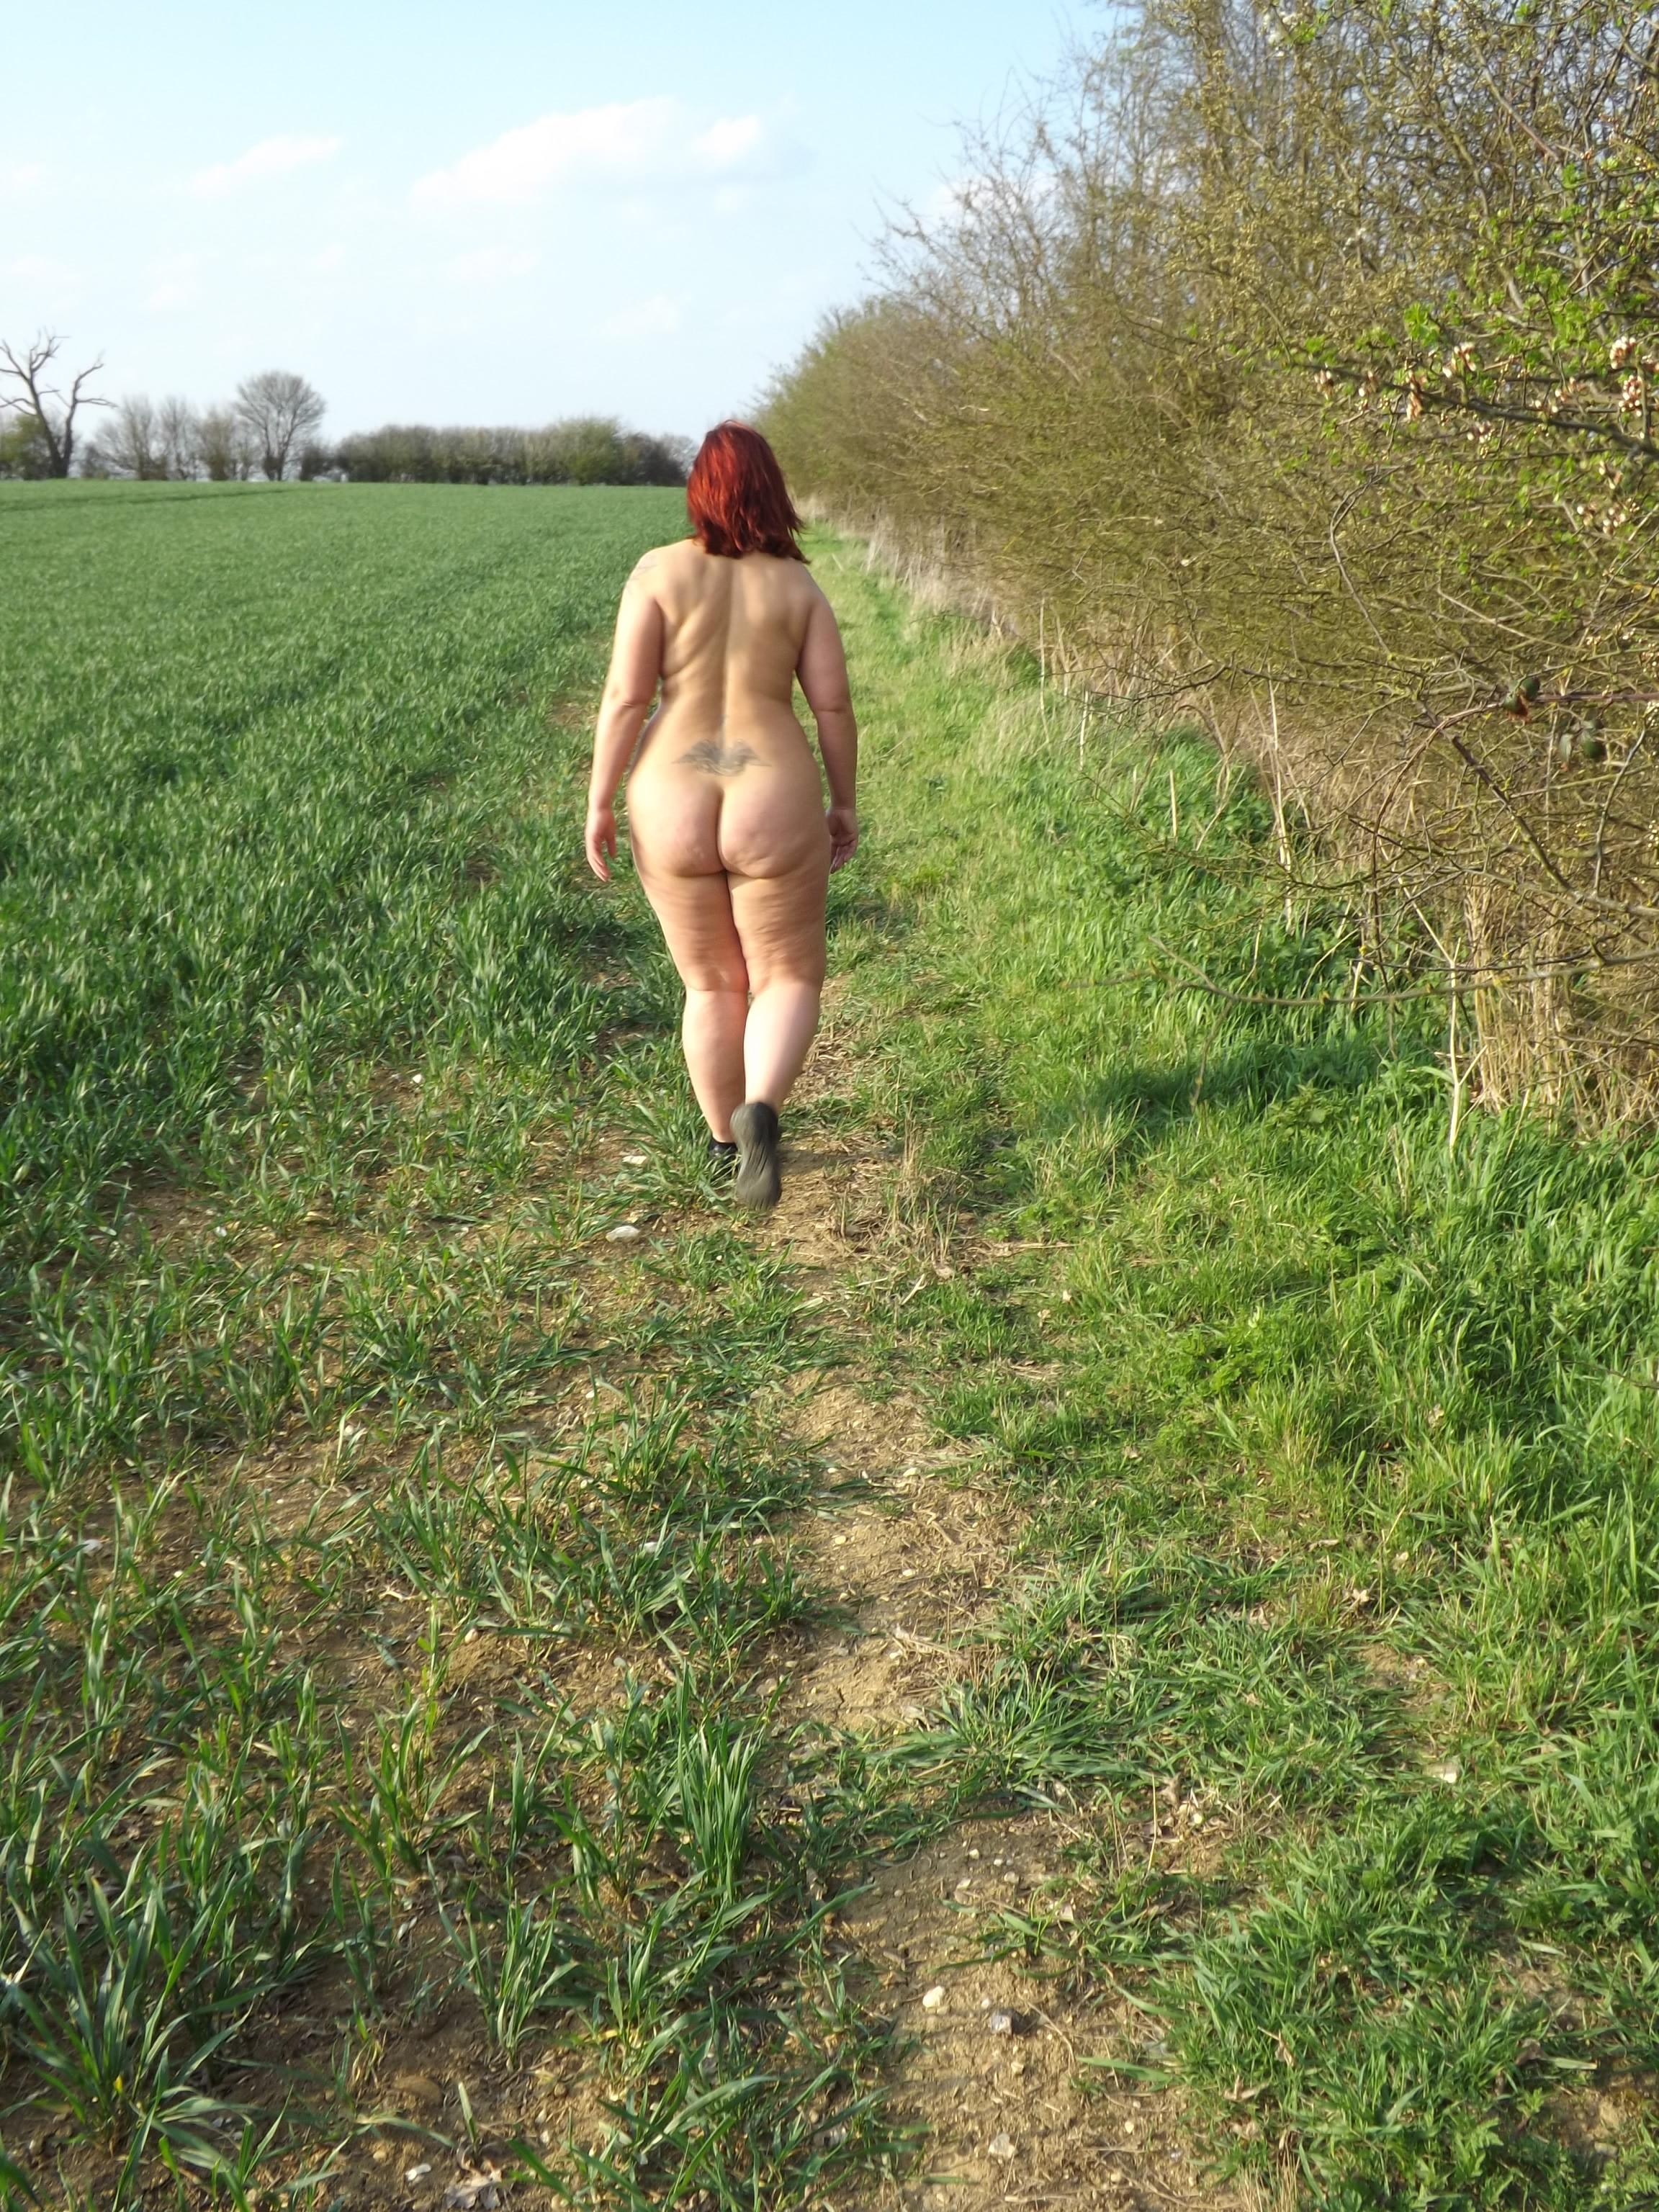 Naturism&family family nudes naturalist nudist kkds